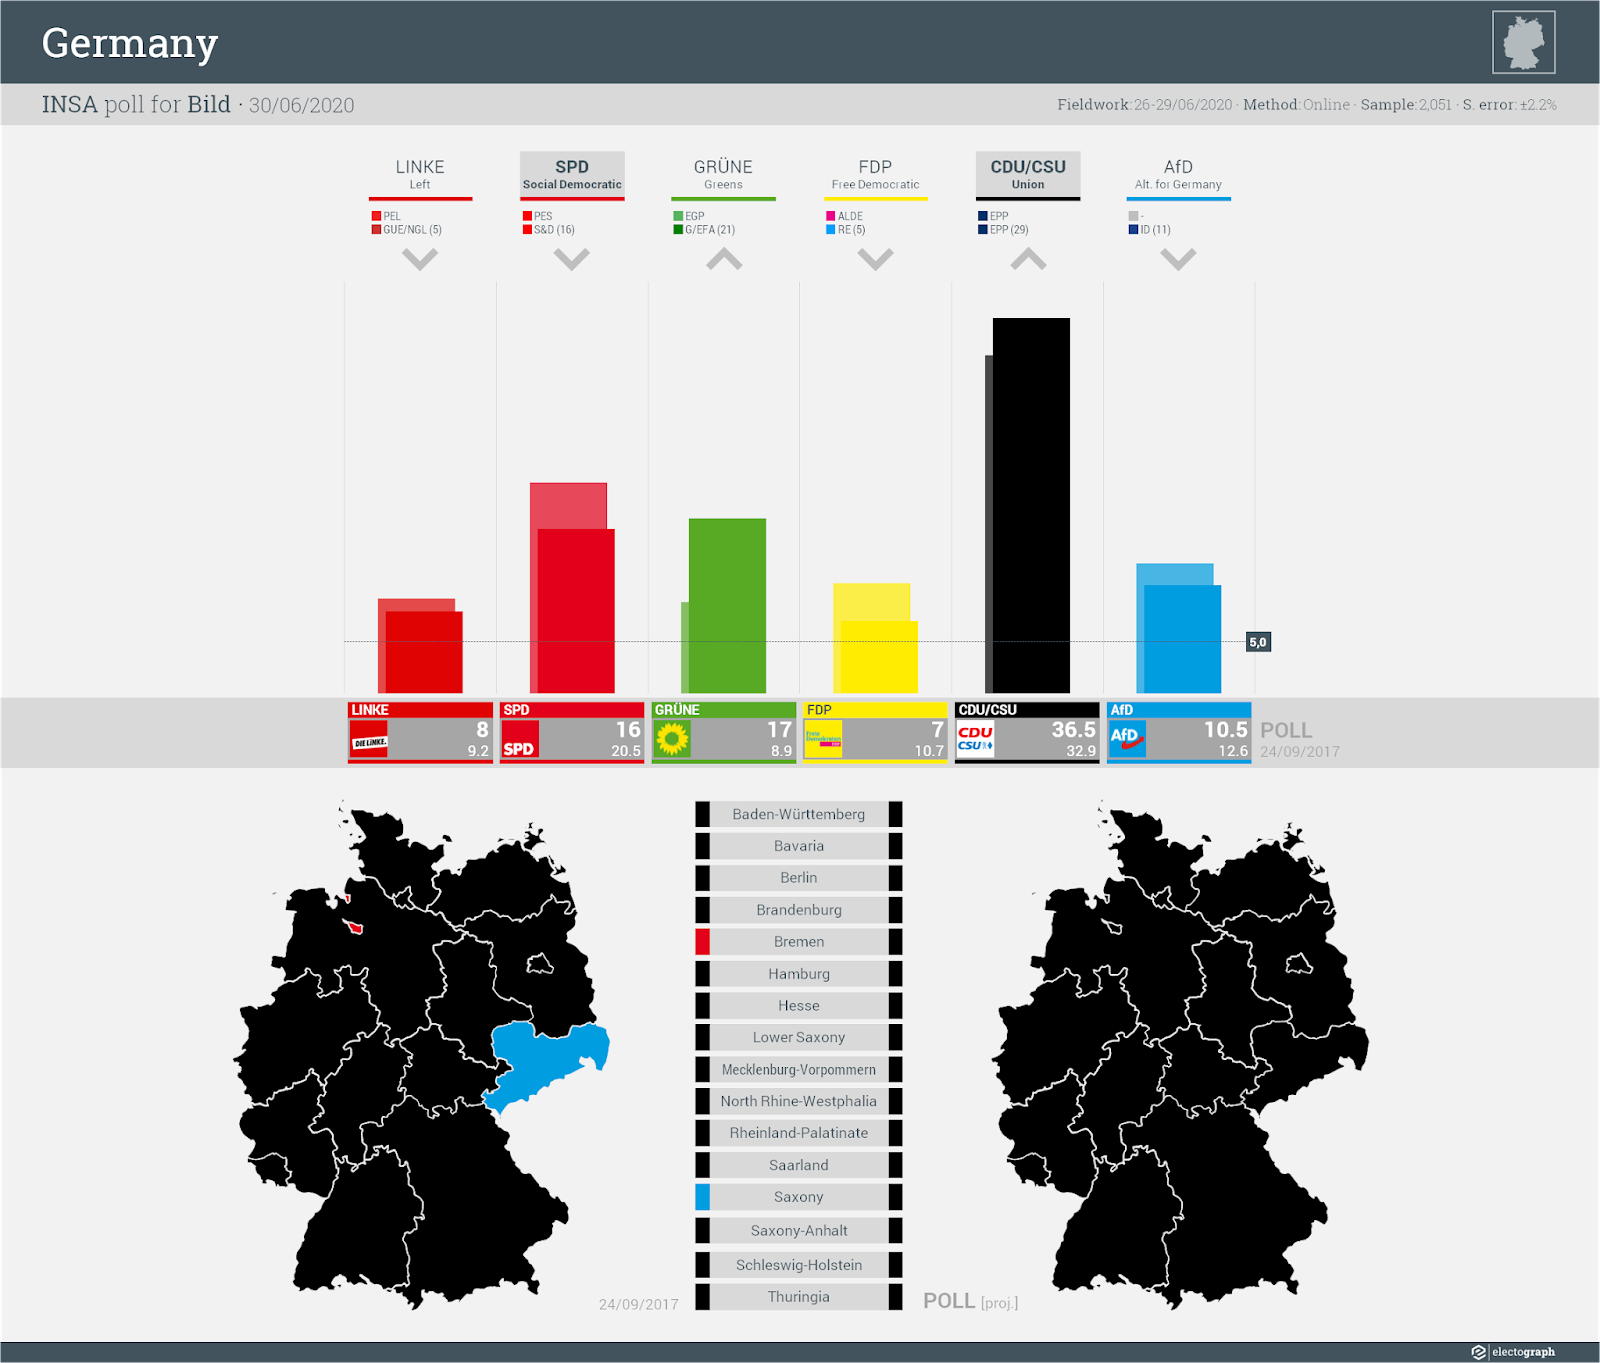 GERMANY: INSA poll chart for Bild, 30 June 2020